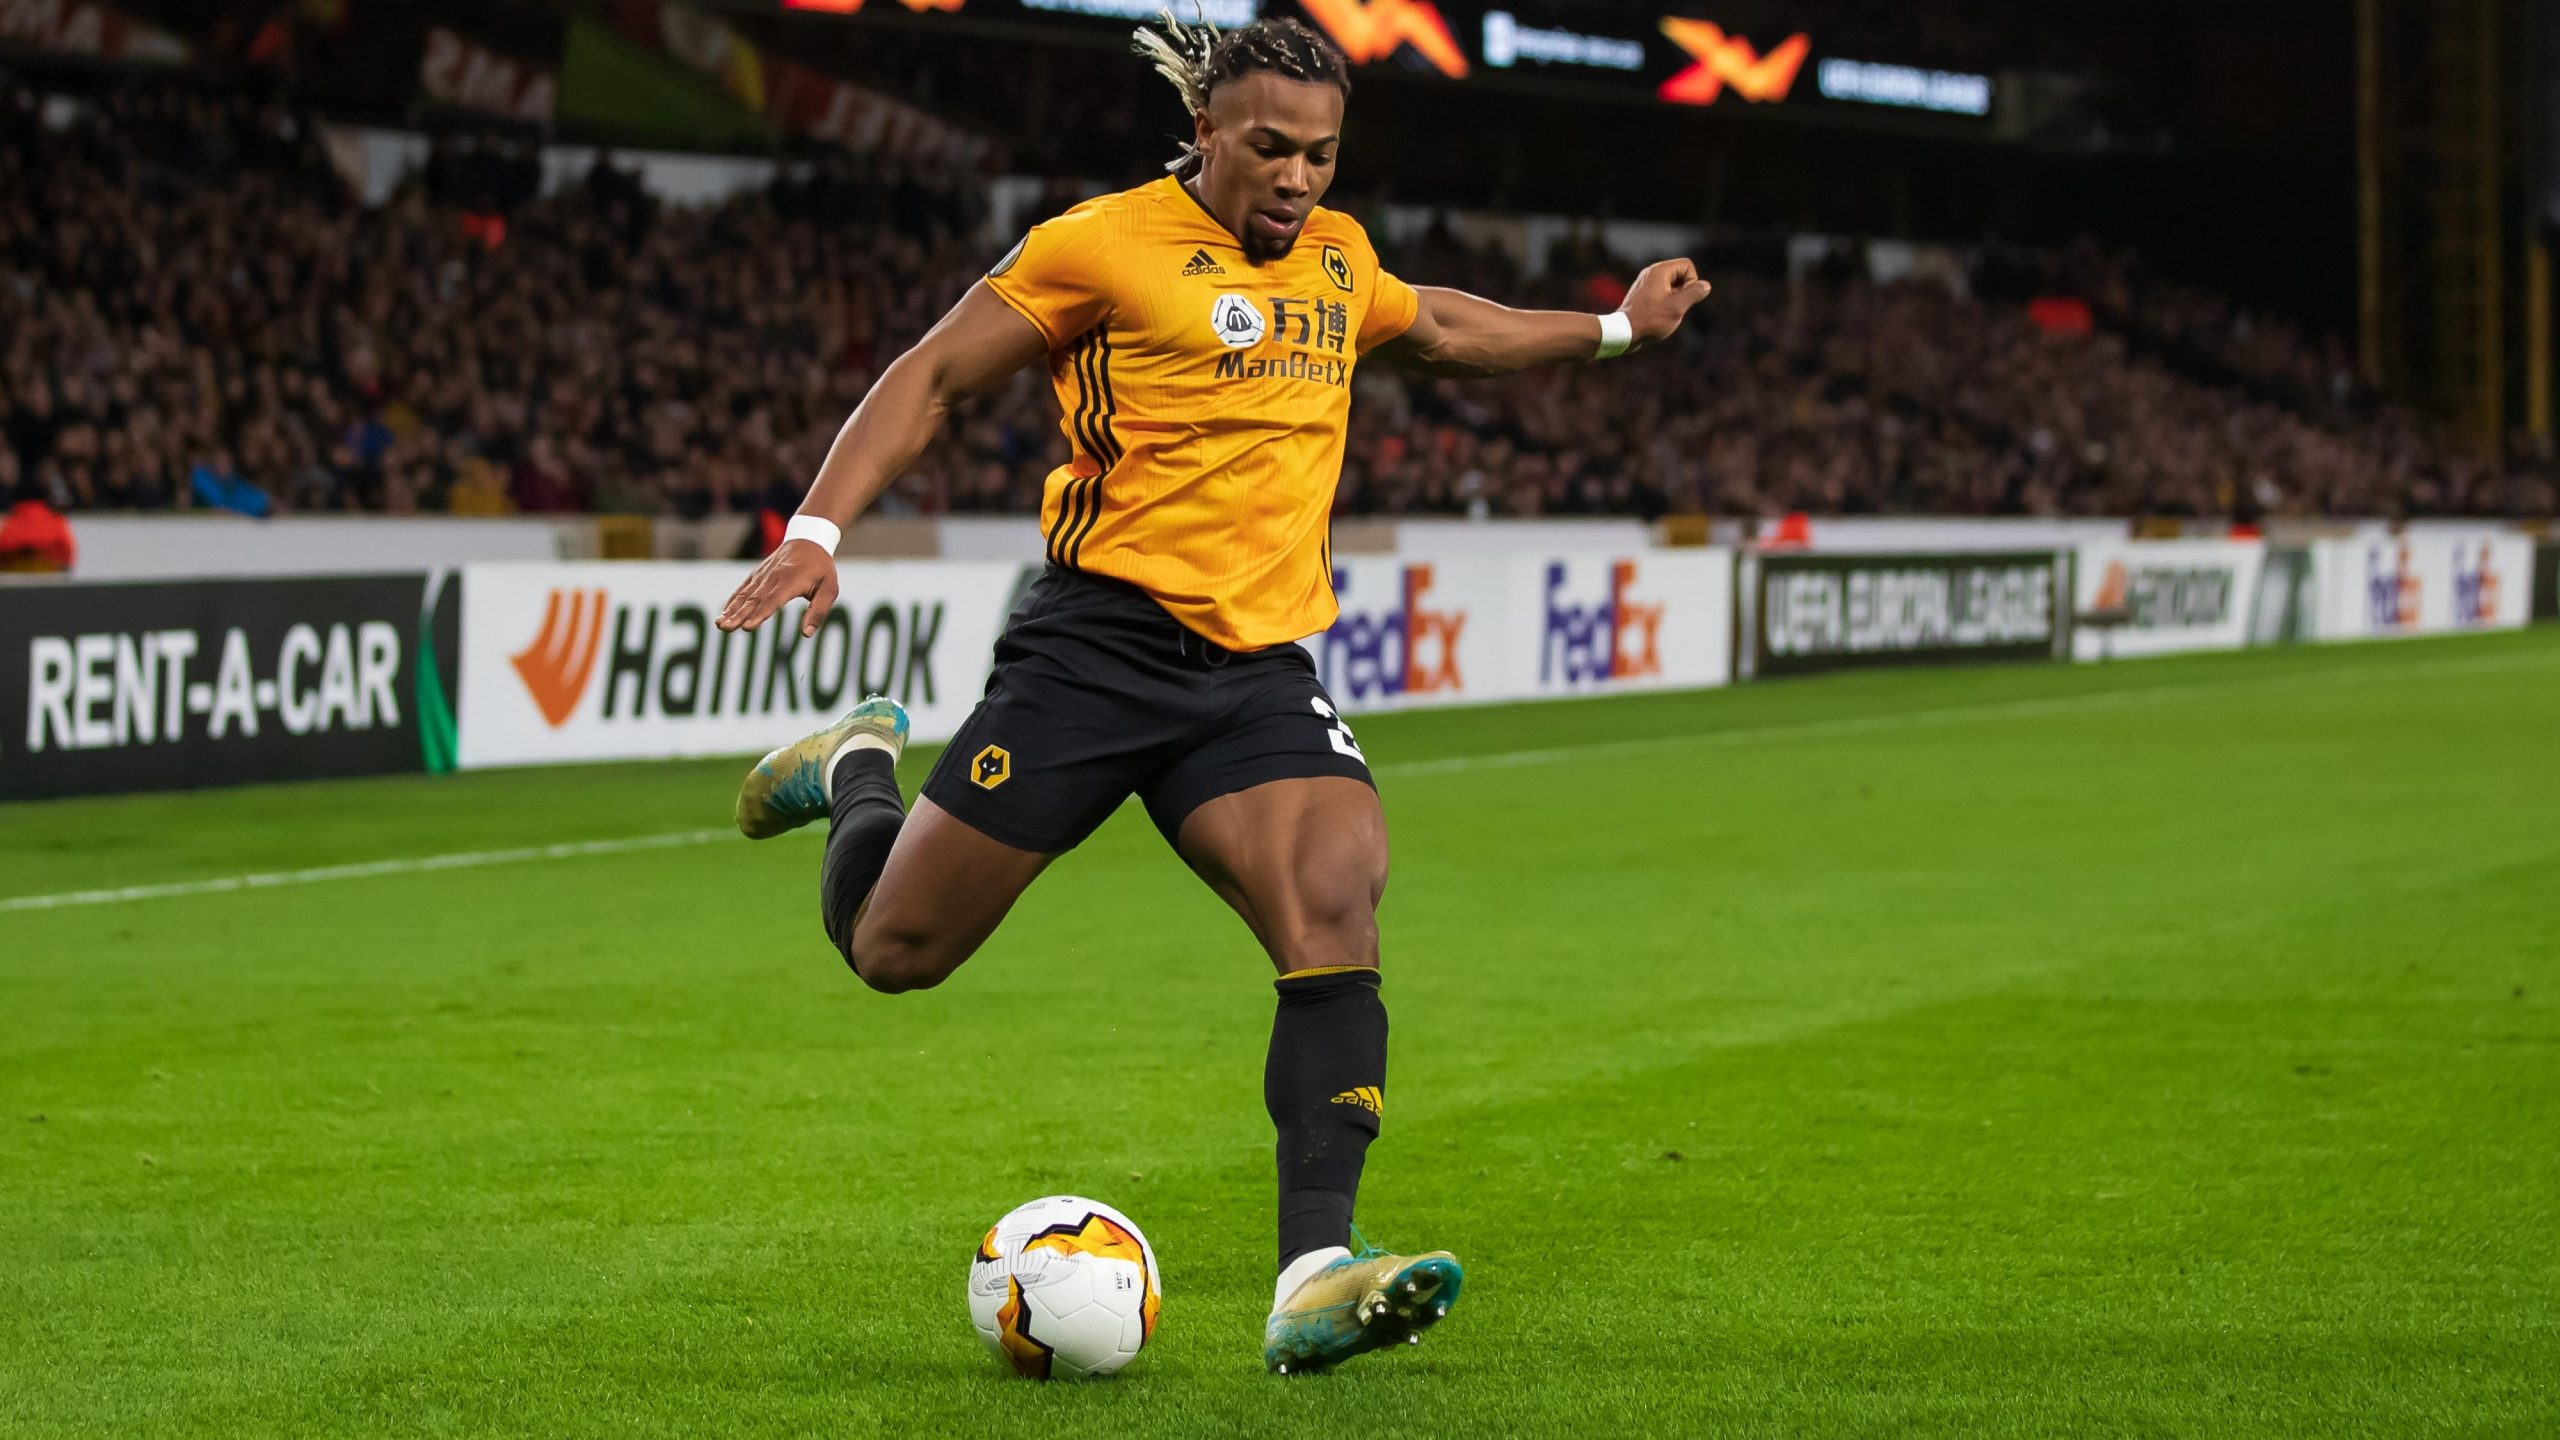 Wolves forward Adama Traore chooses Spain over Mali - Sports Leo